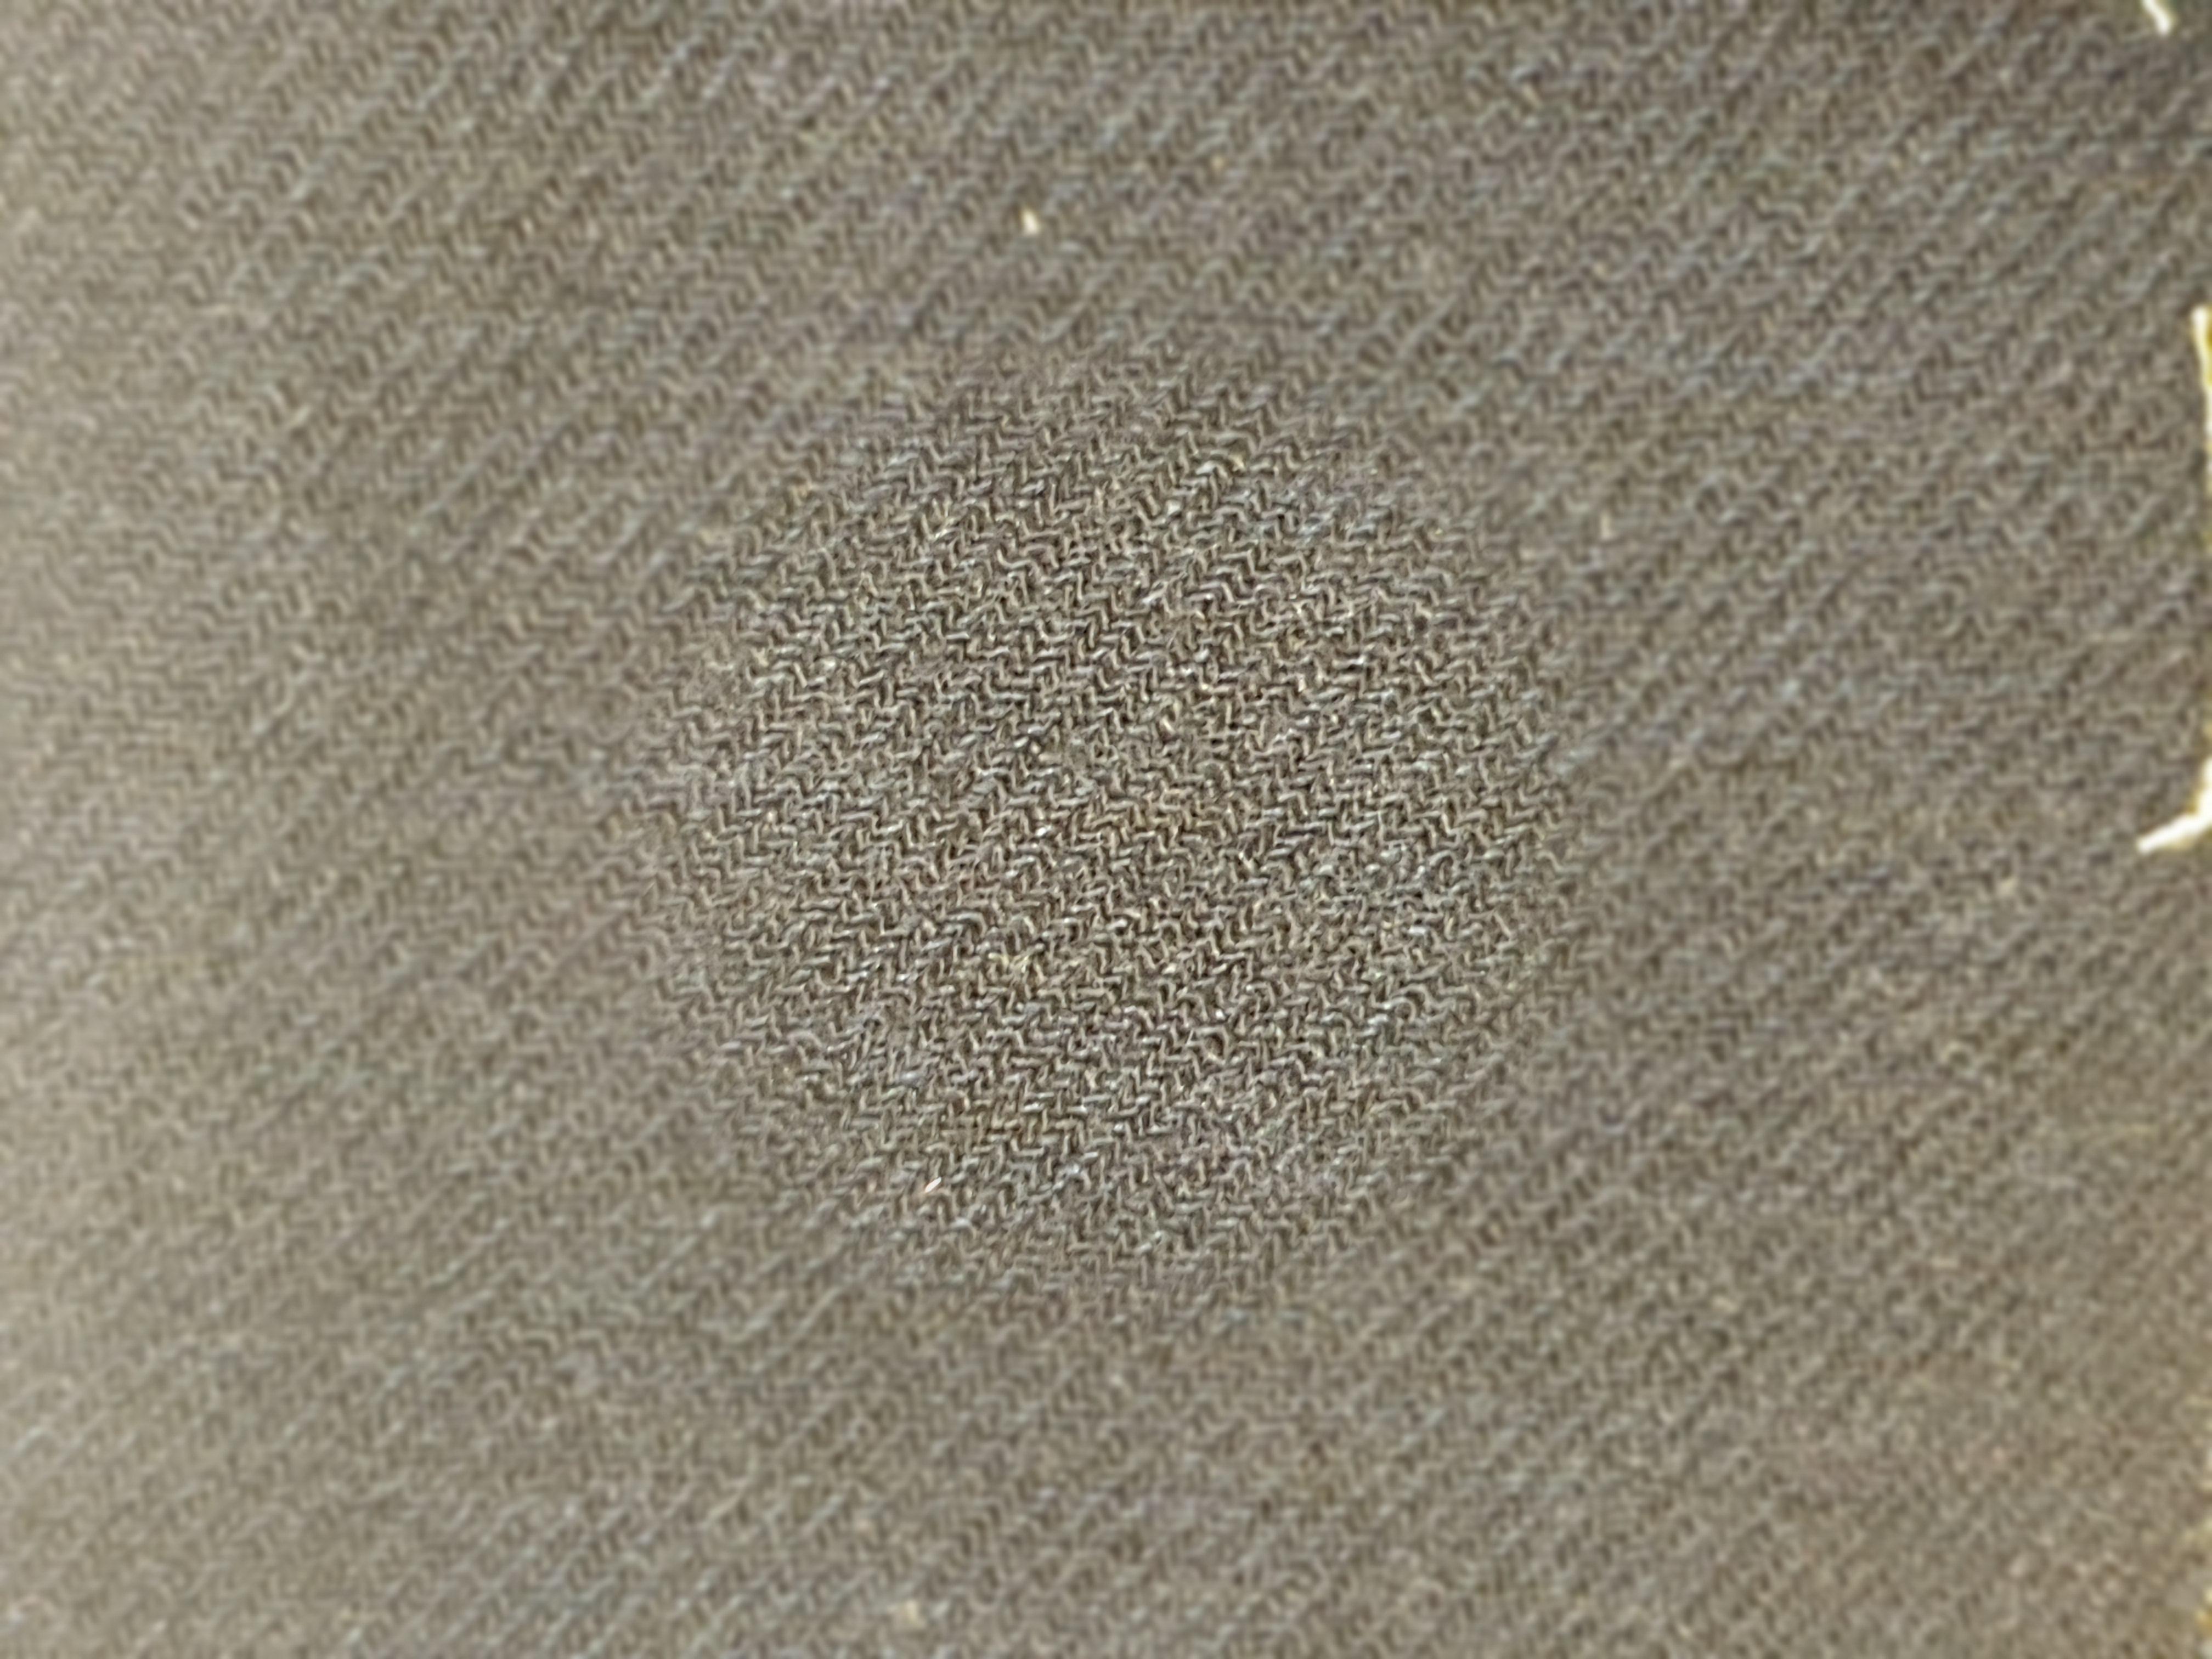 ART 7488 WIDTH cm143 WEIGHT gr230 - gr160 square meter - COMPOSITION 80 viscose 20 wool - 200mts